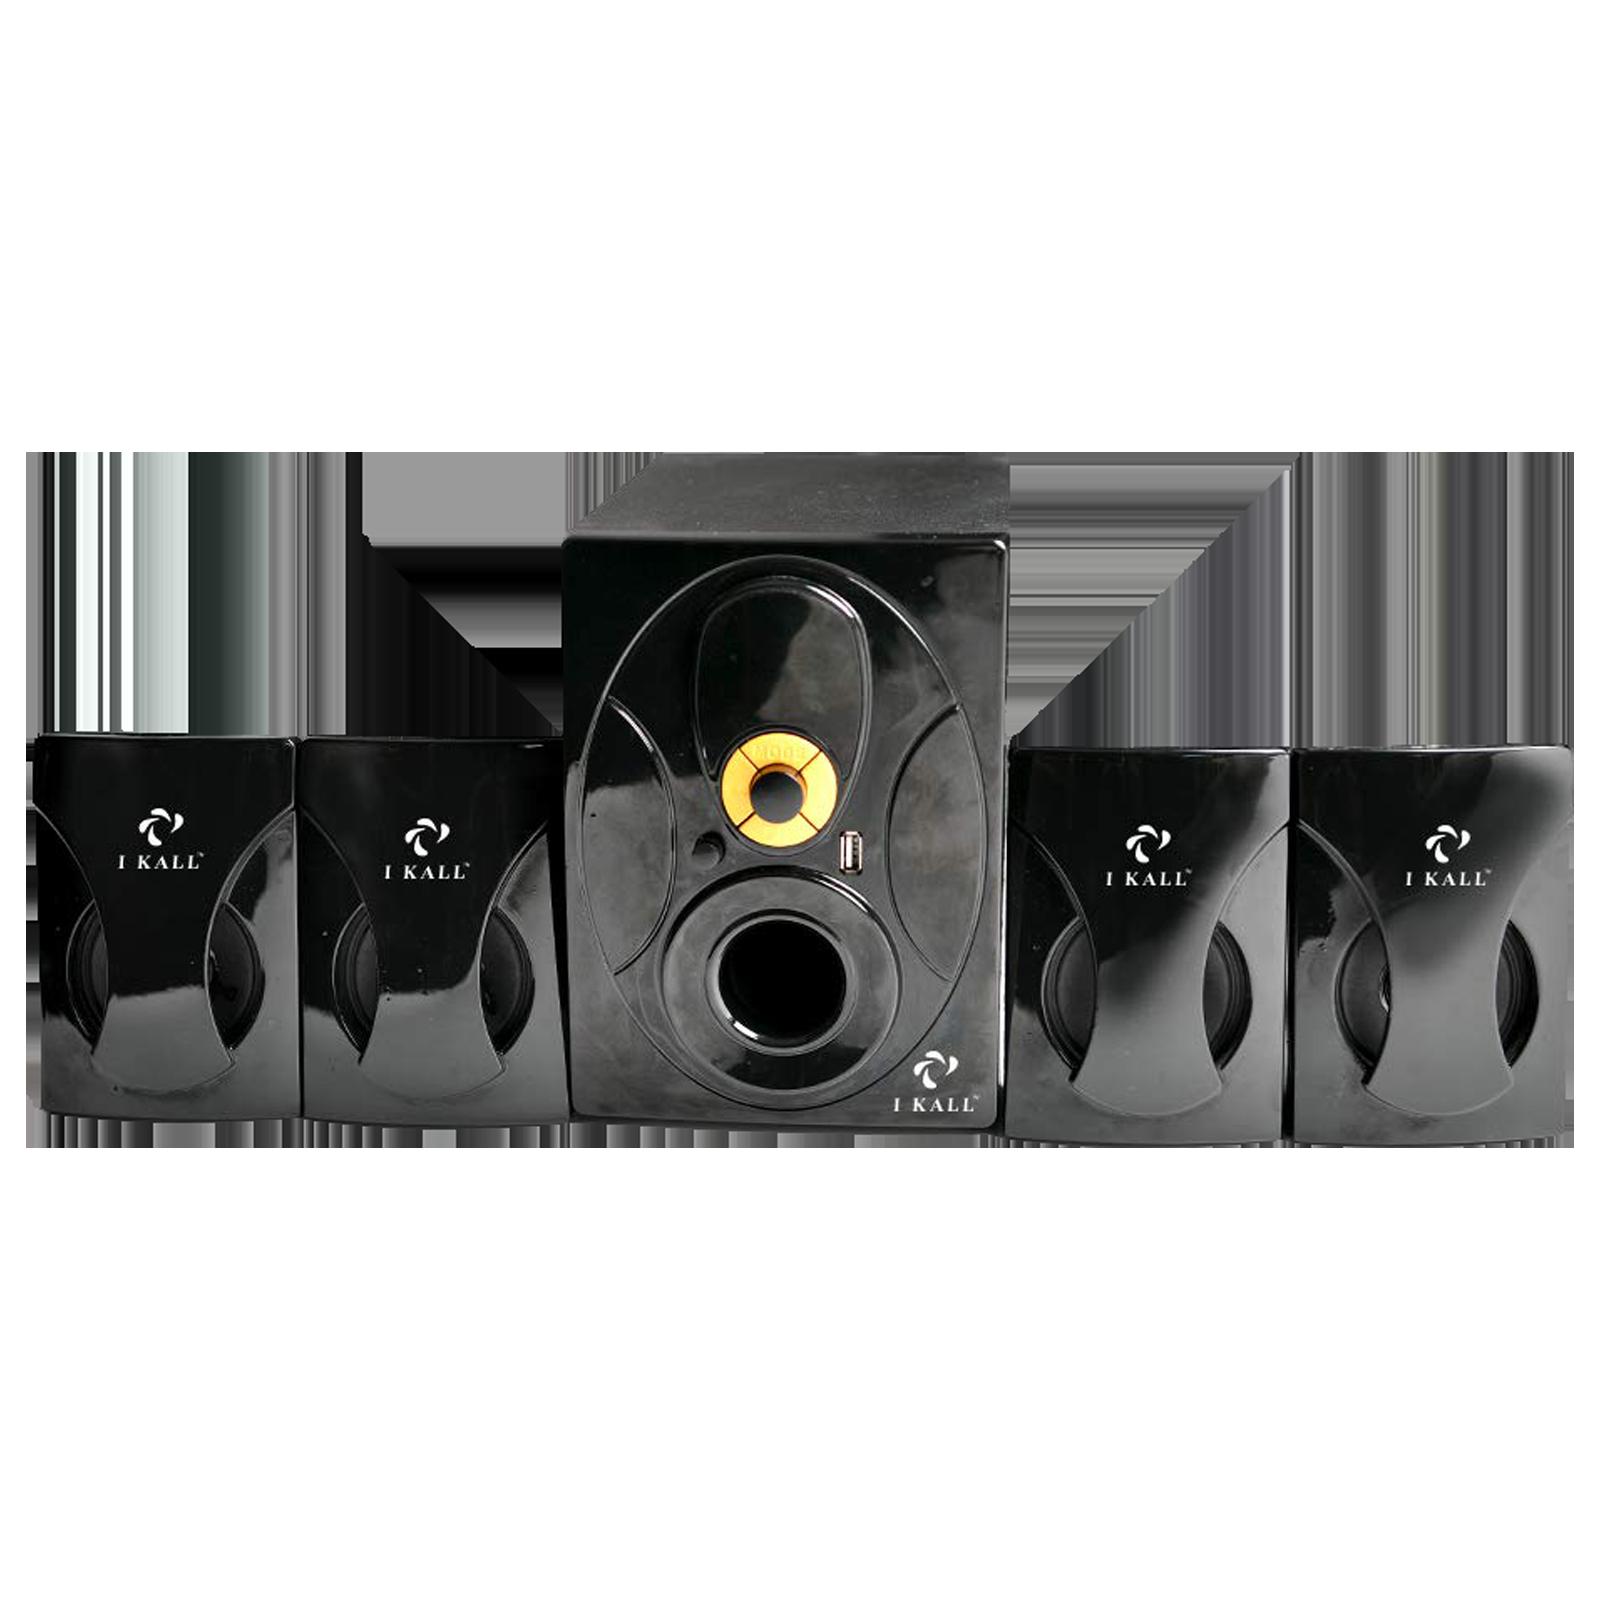 I KALL 4.1 Channel 60 Watts Standard Home Theatre System (LED Display, IK-202, Black)_1